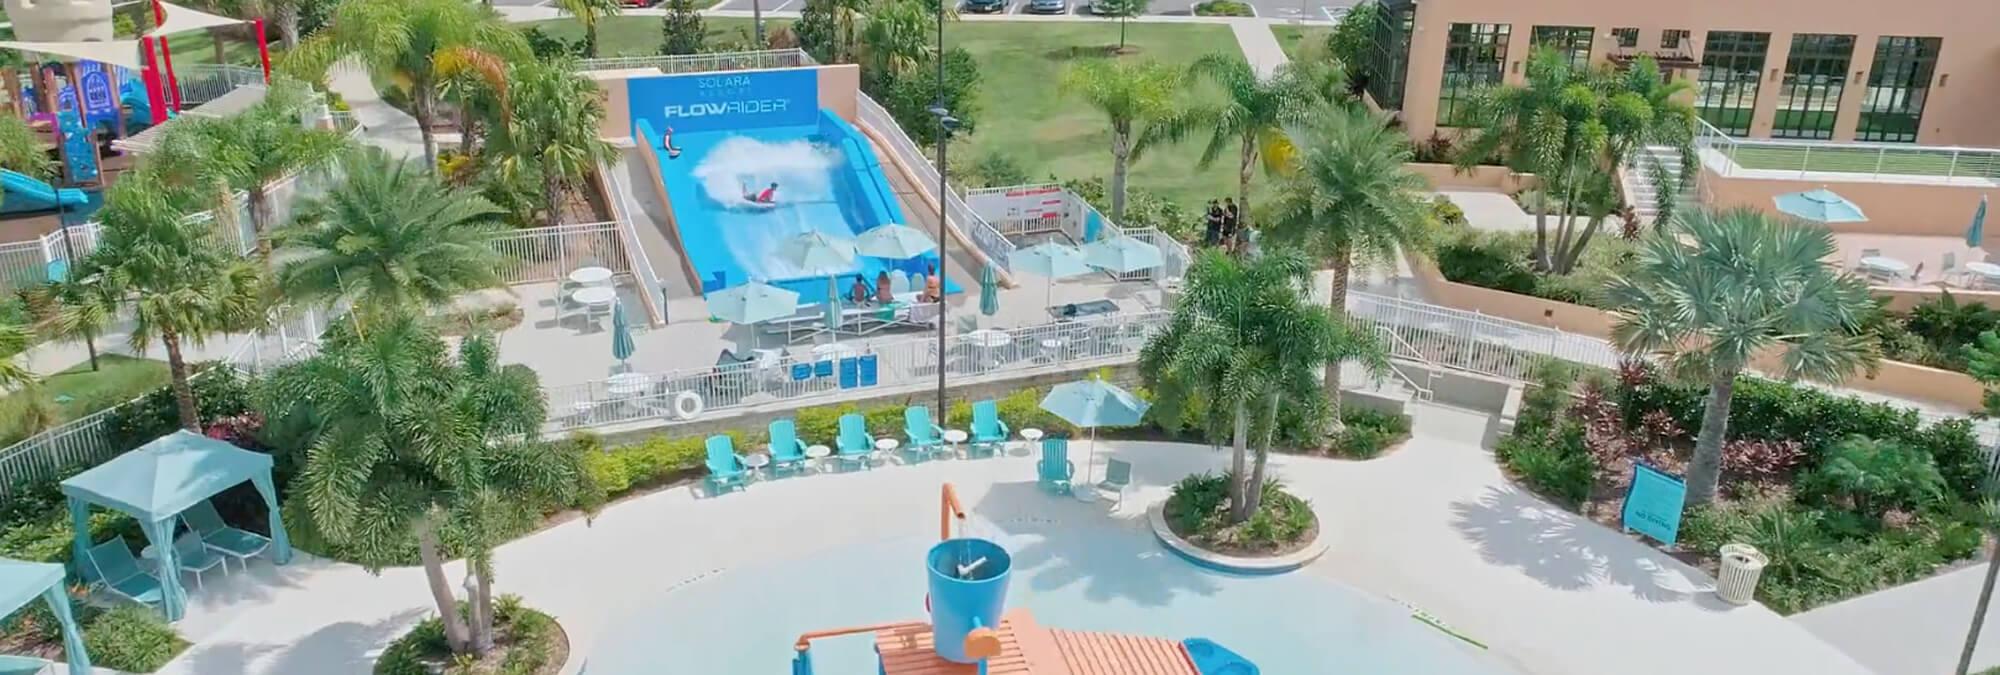 Orlando solara resort